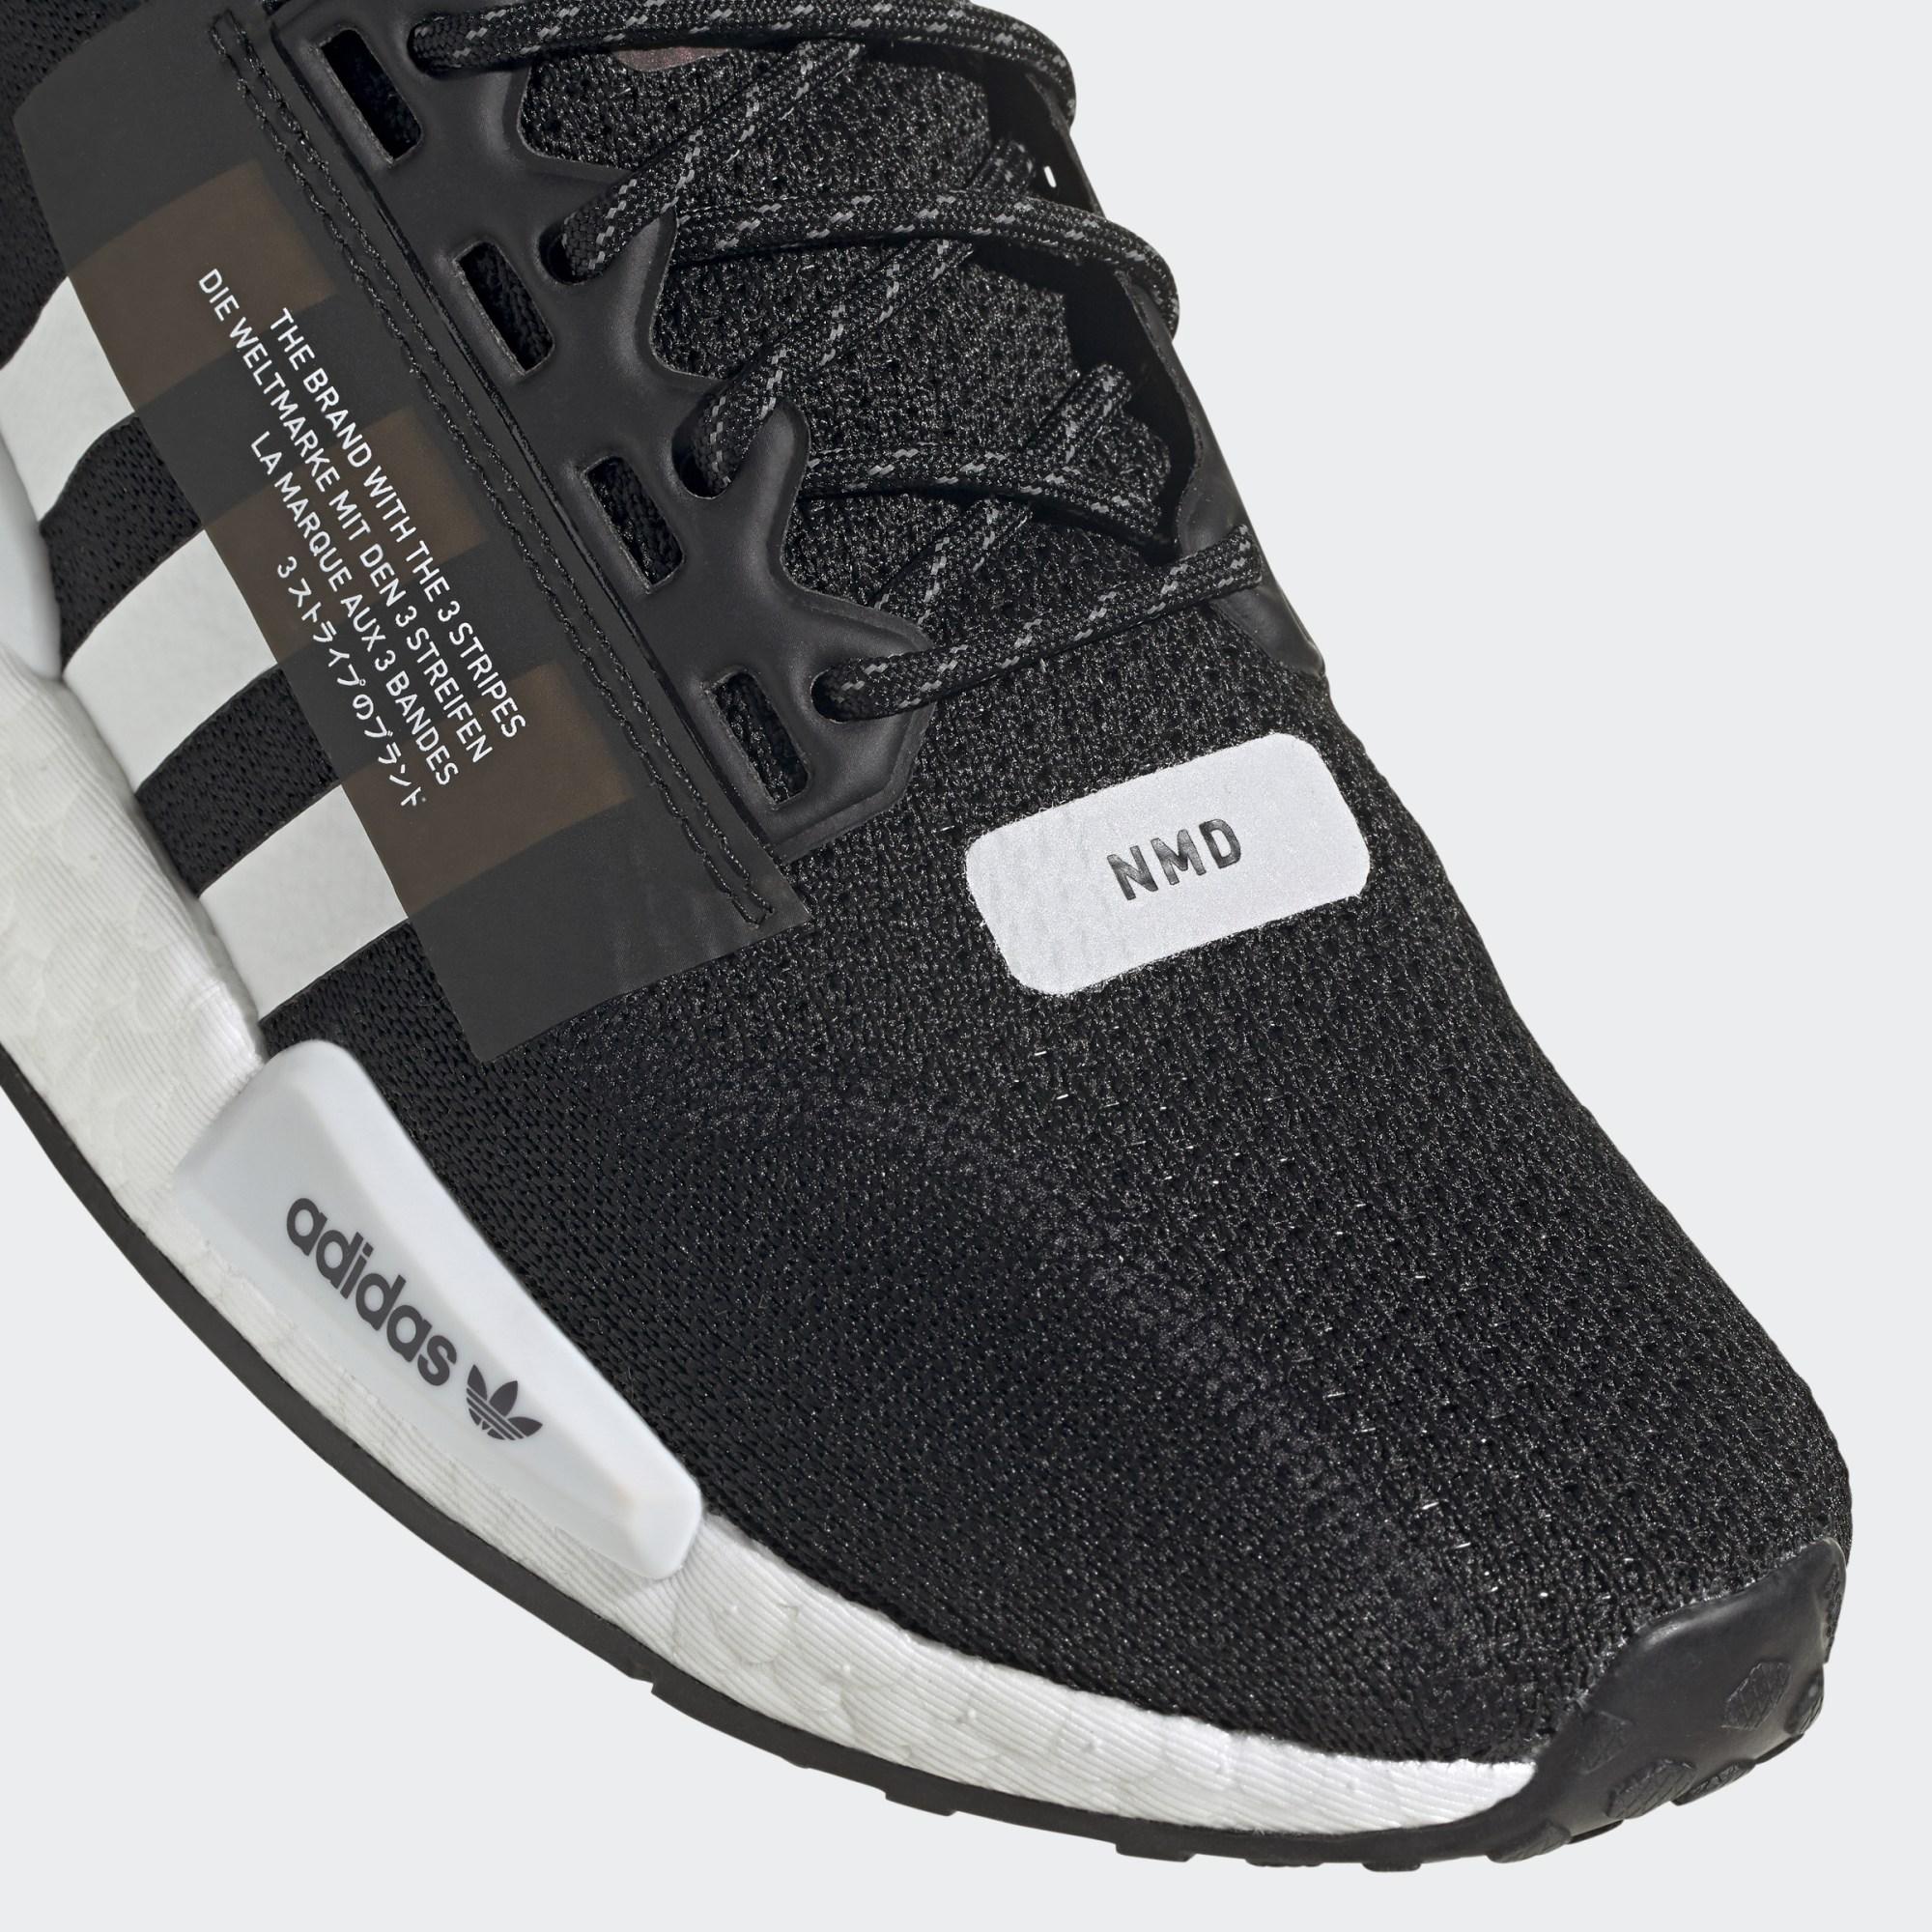 NMD_R1_V2_Shoes_Black_FV9021_43_detail.jpg